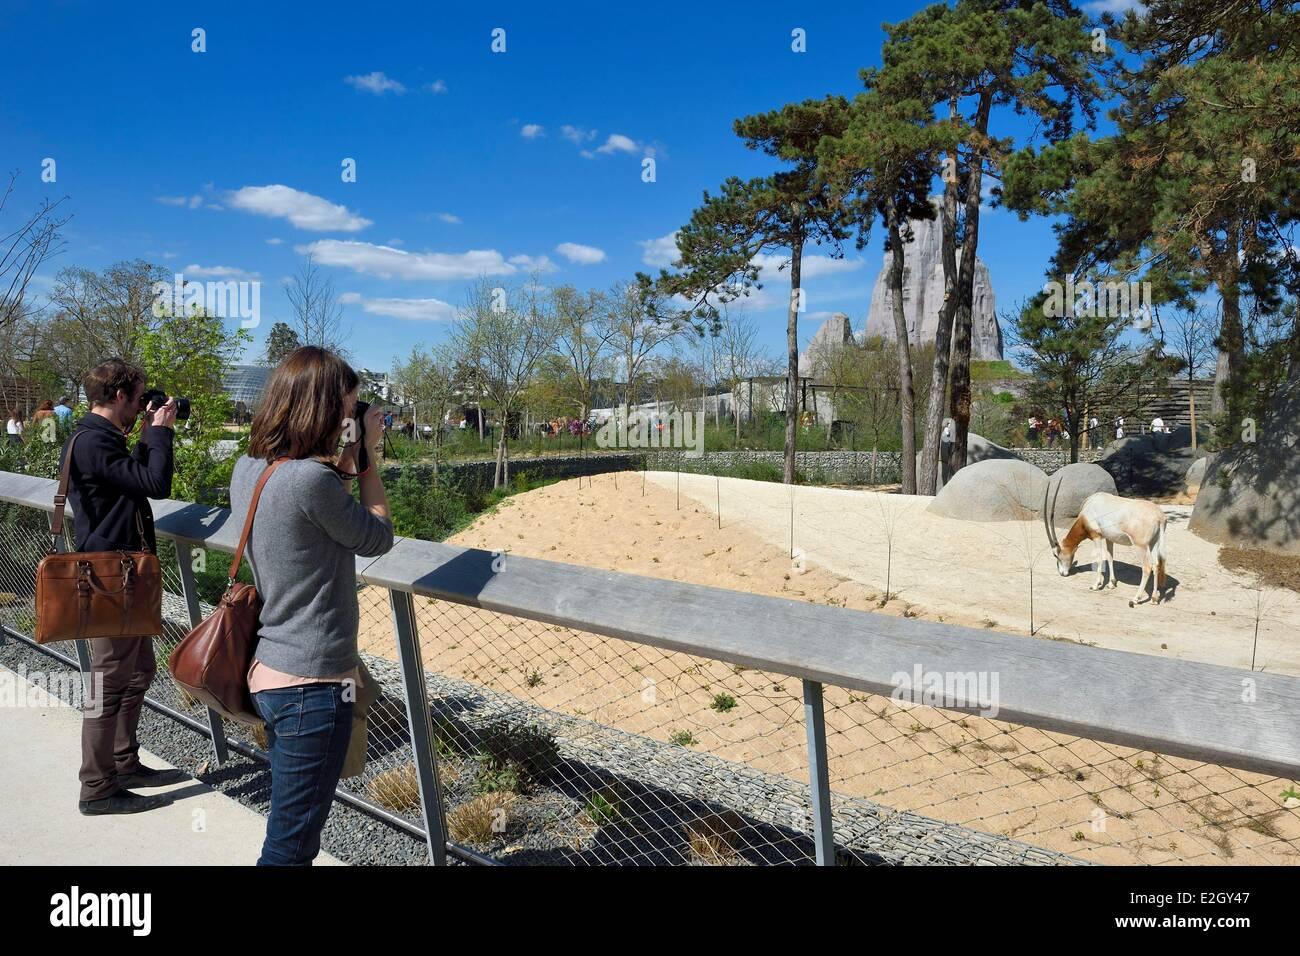 France Paris Paris Zoological Park (Zoo de Vincennes) Scimitar-horned oryx (Oryx dammah) in Sahel-Sudan biozone - Stock Image